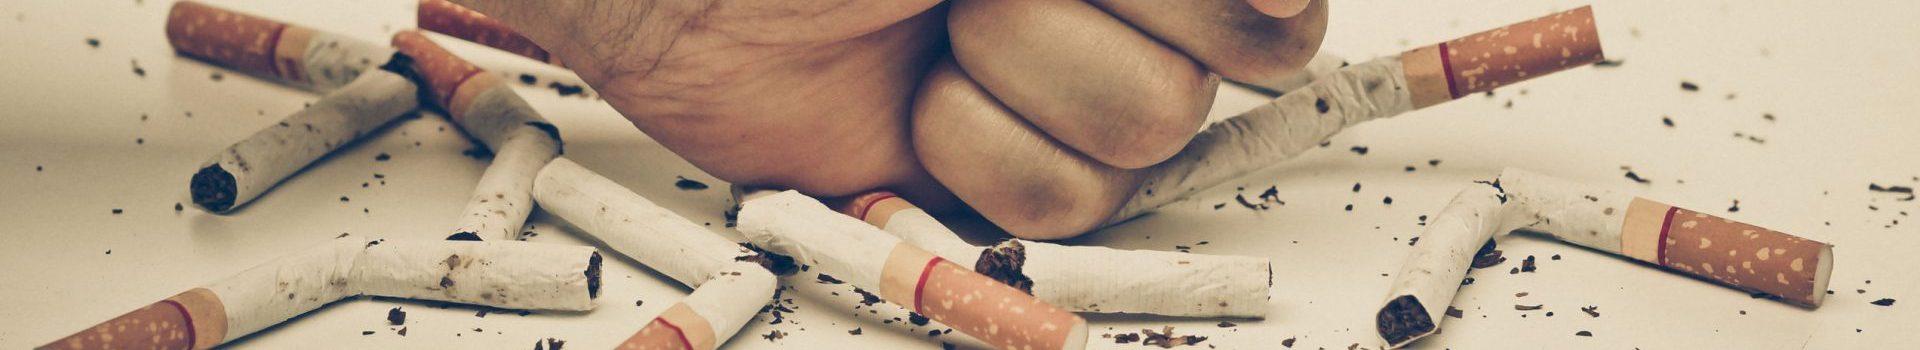 Roken en zwangerschap